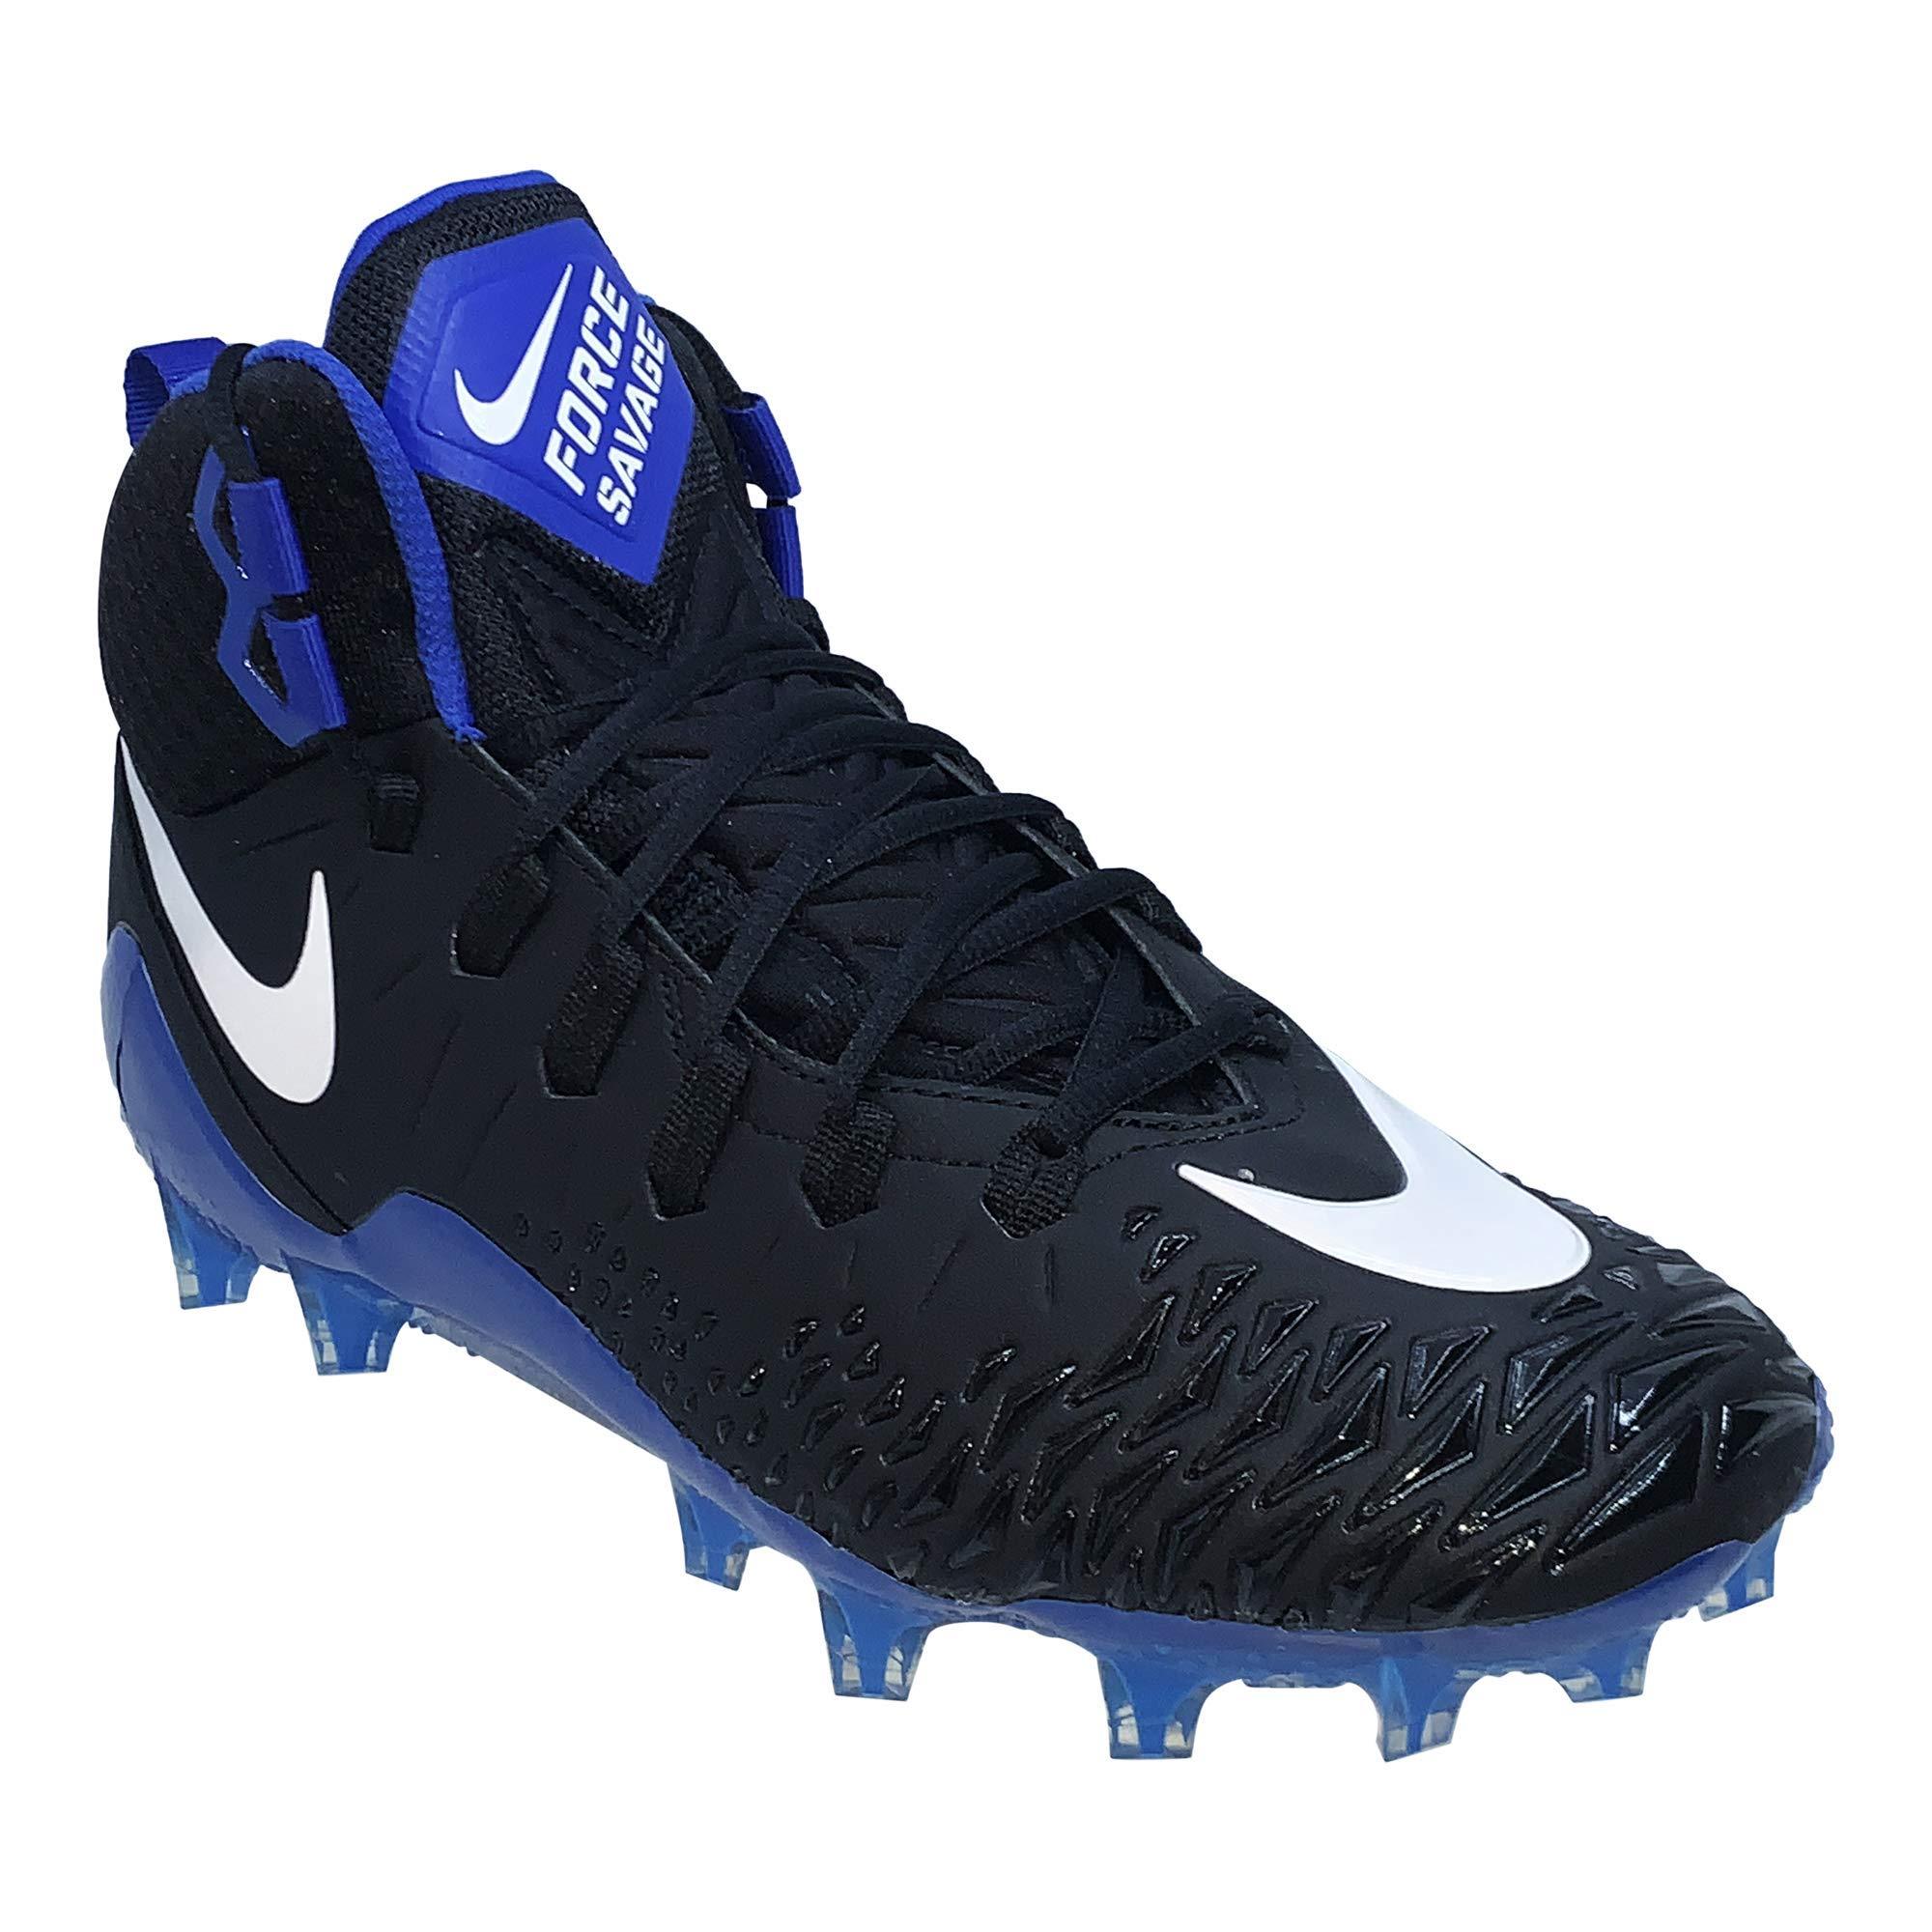 Nike Mens Force Savage Pro Football Cleat (7.5, Black/White/Game Royal)